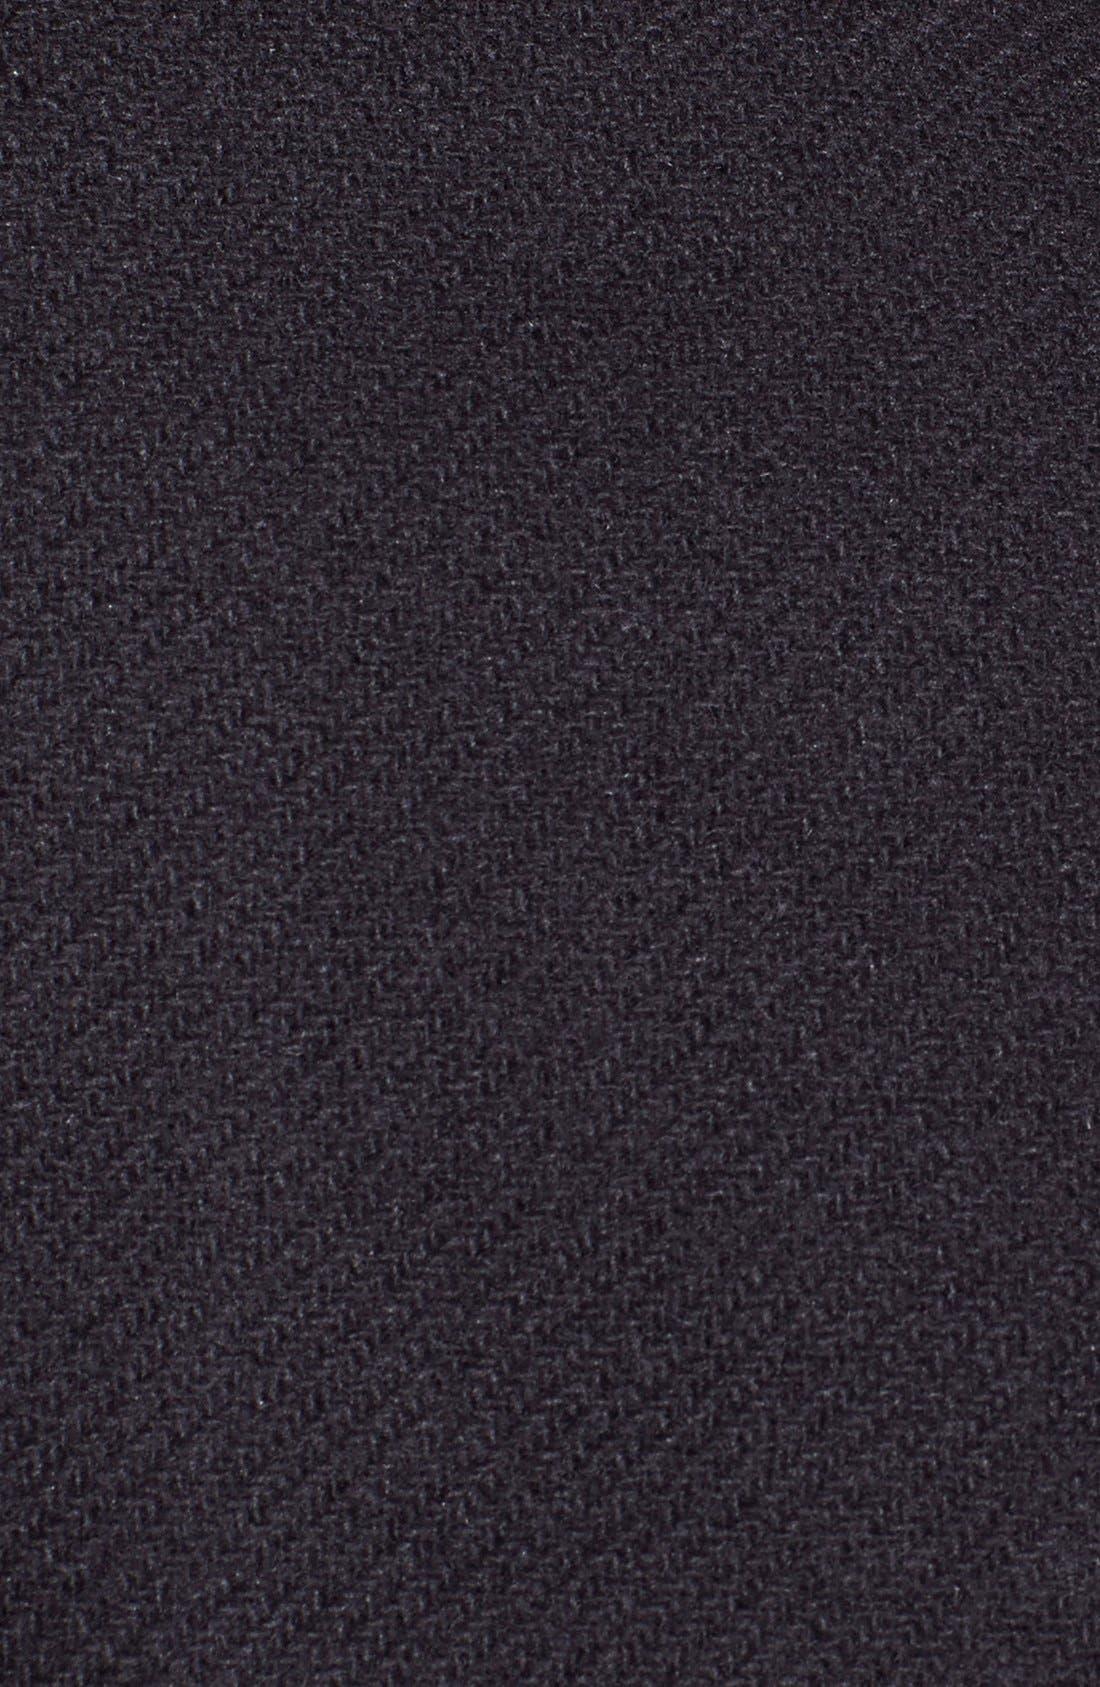 Alternate Image 3  - Burberry Brit 'Rushfield' Wool Blend Stand Collar Coat